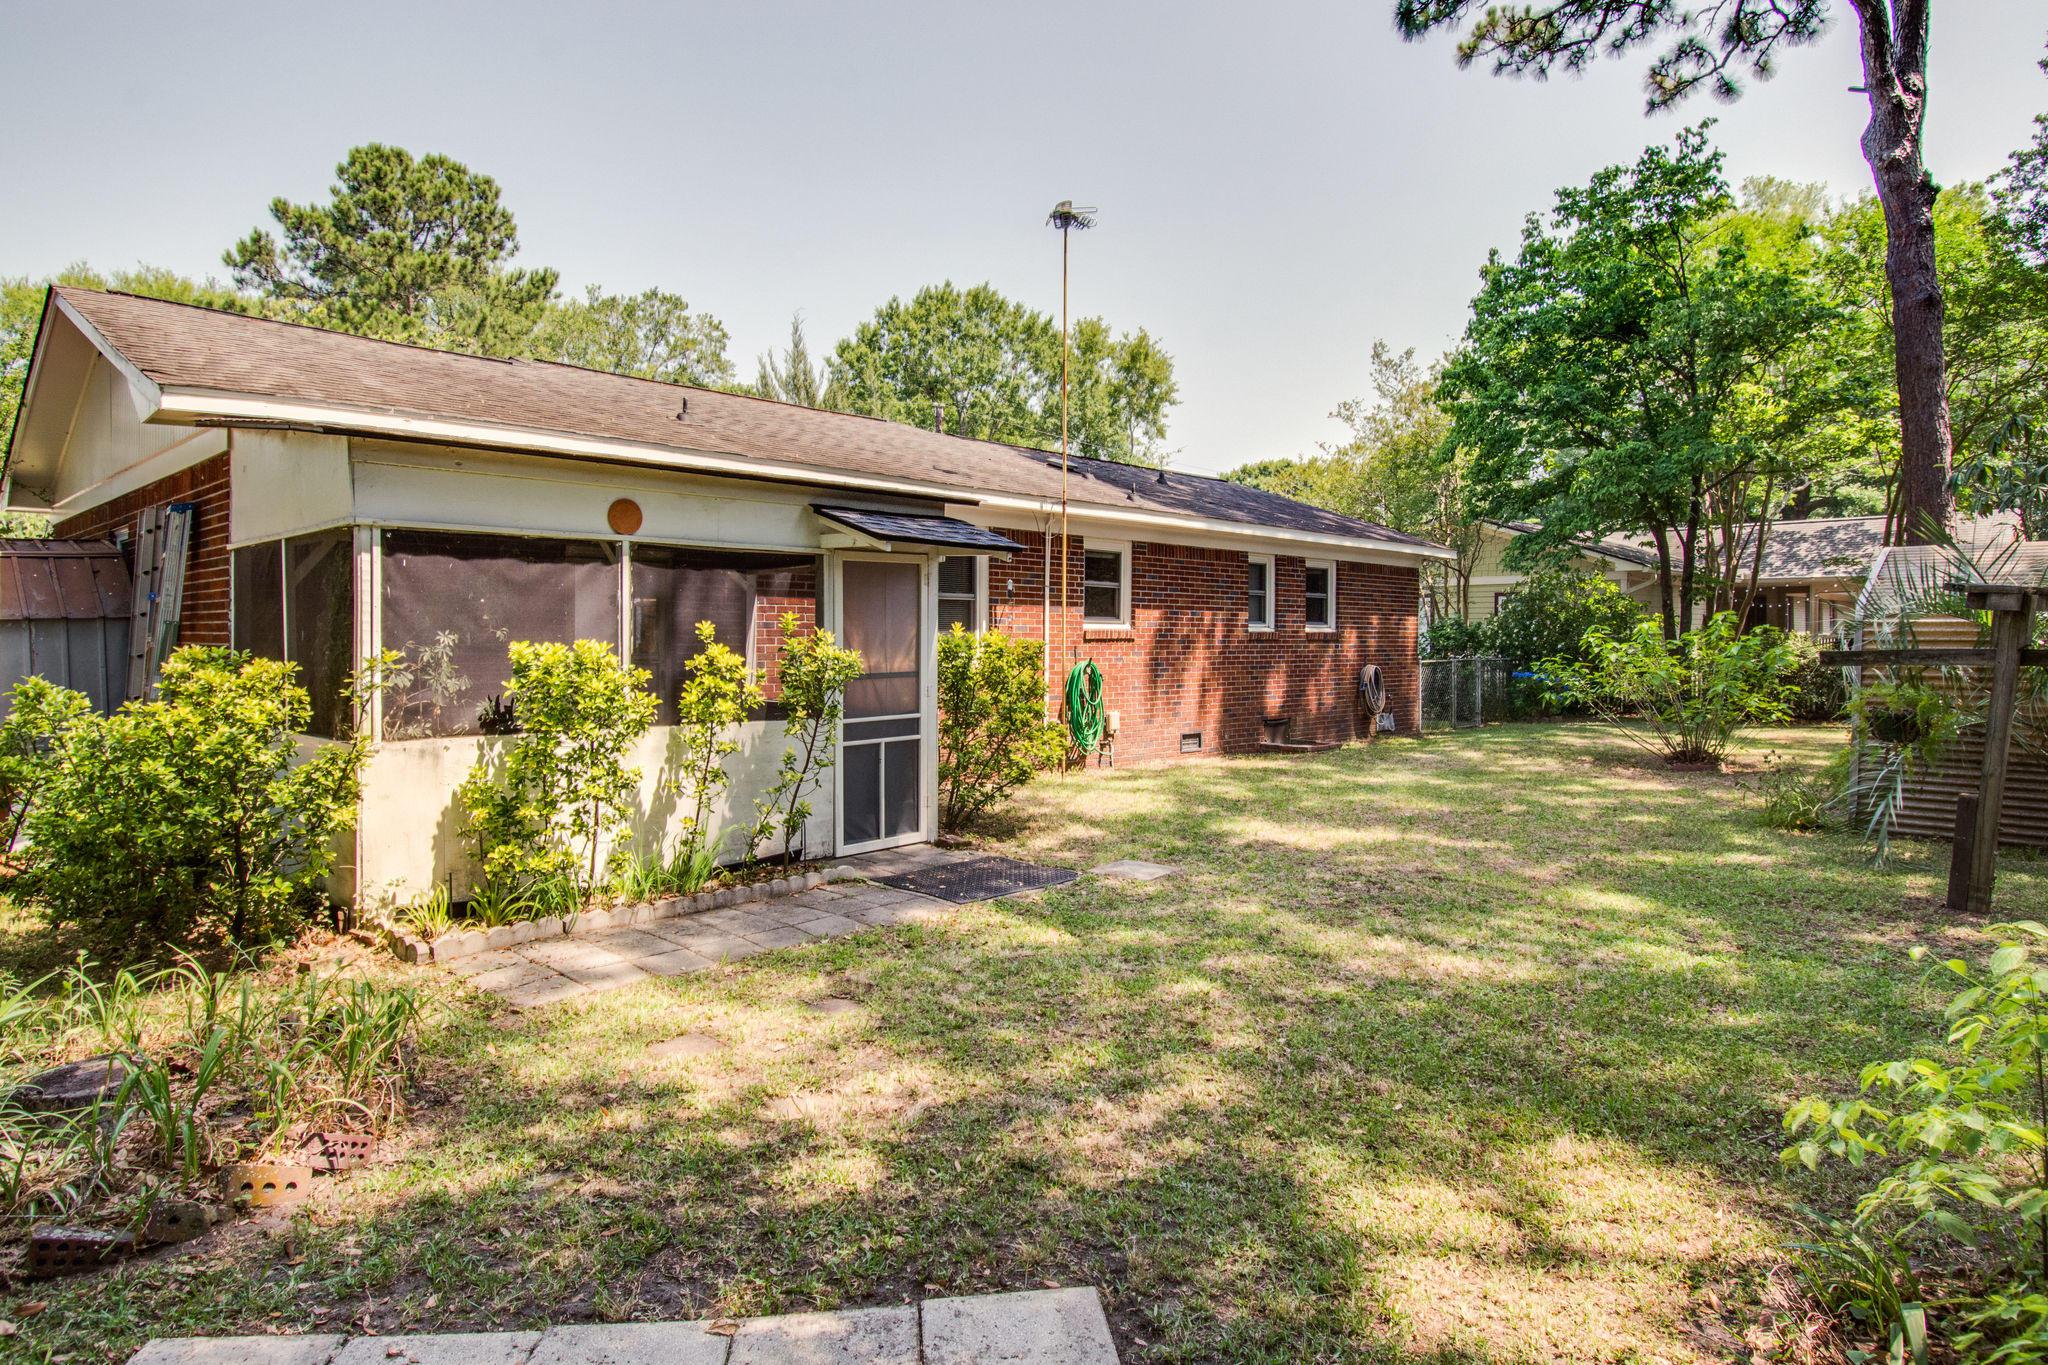 Old Mt Pleasant Homes For Sale - 1327 Lonnie, Mount Pleasant, SC - 12